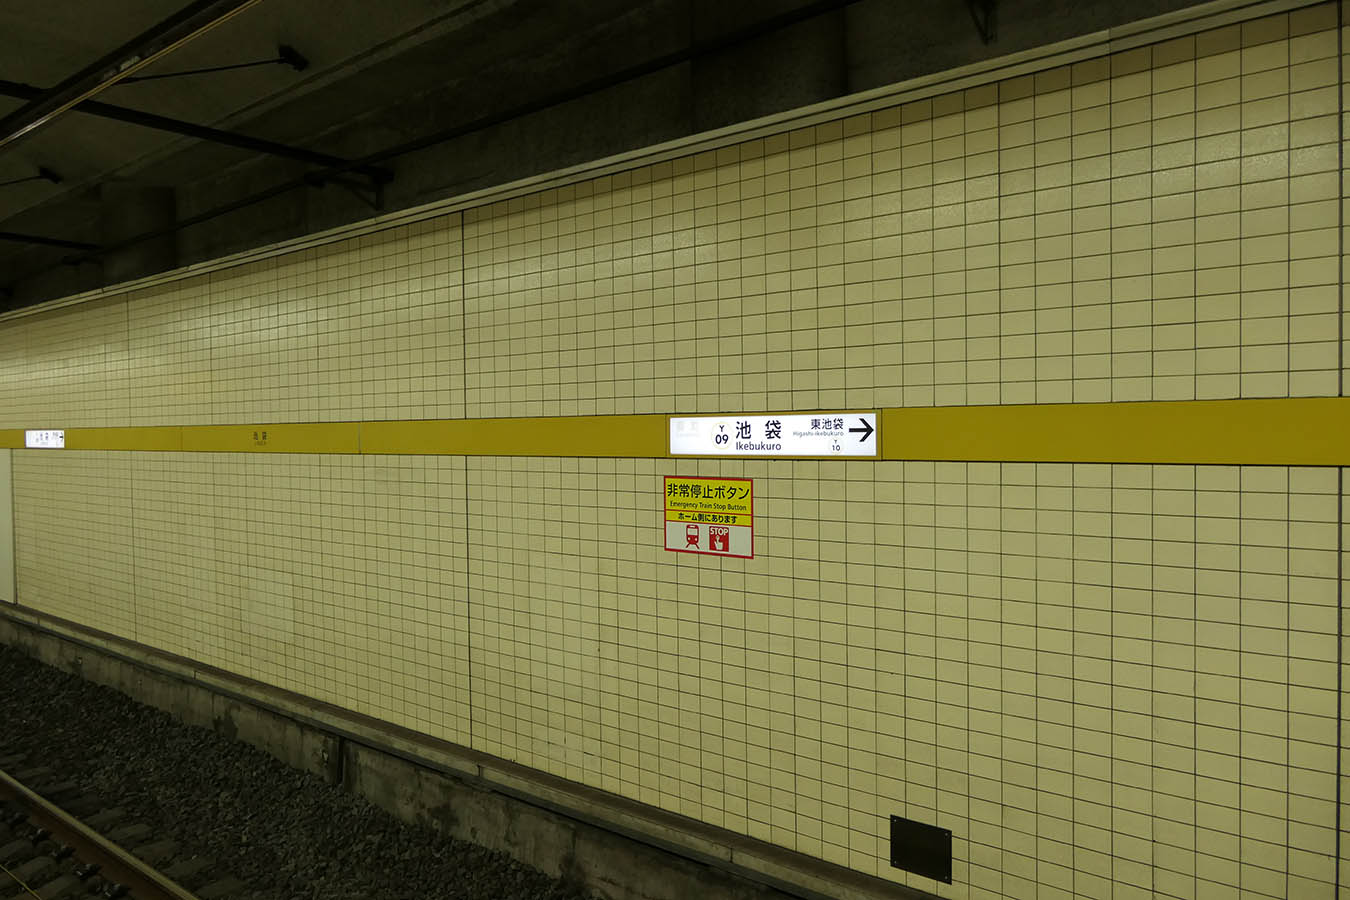 Y09_photo01.jpg